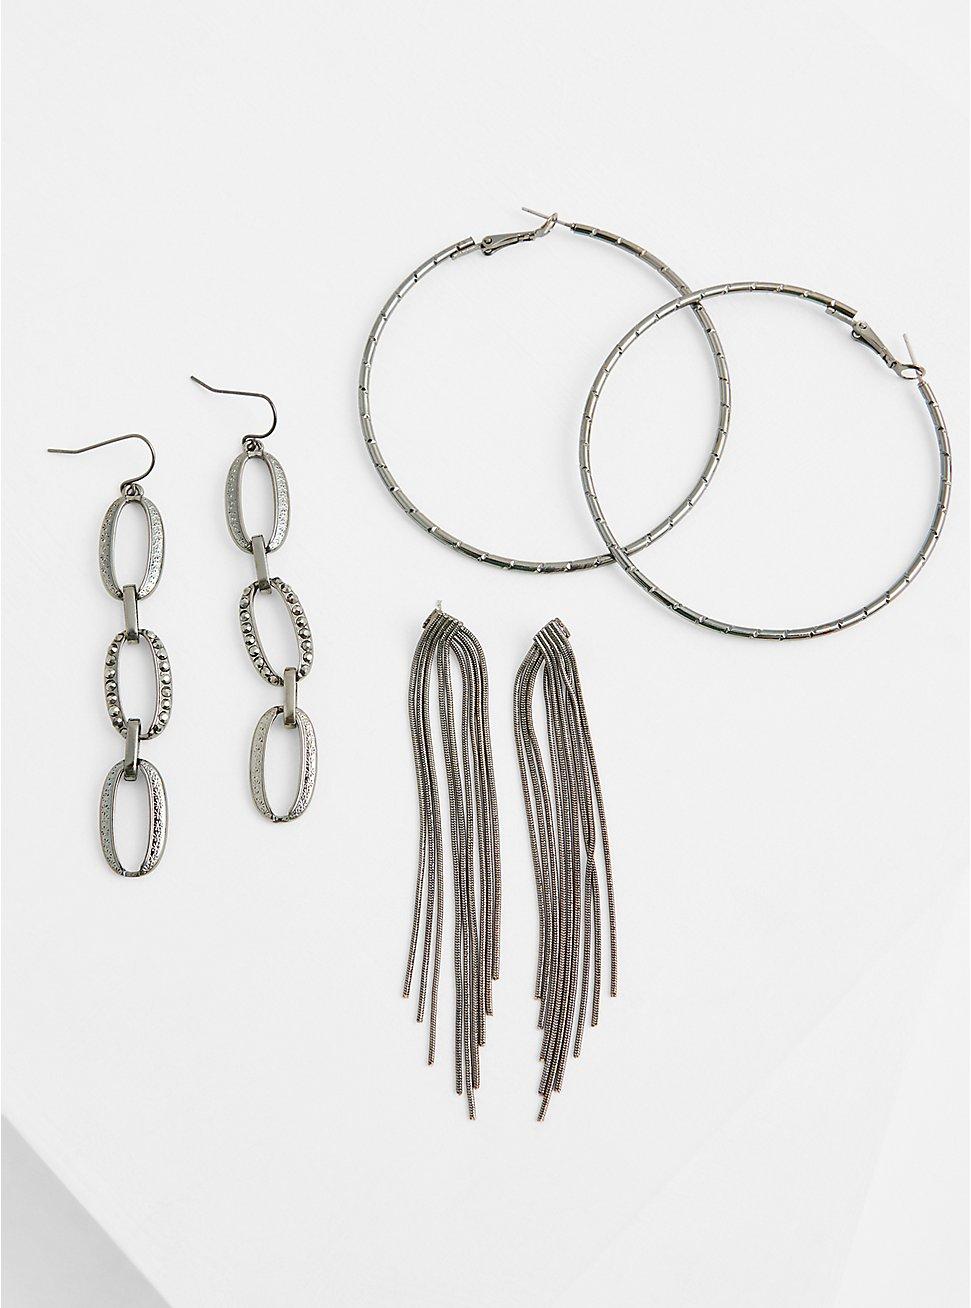 Burnished Silver-Tone Fringe Earrings Set - Set of 3, , hi-res